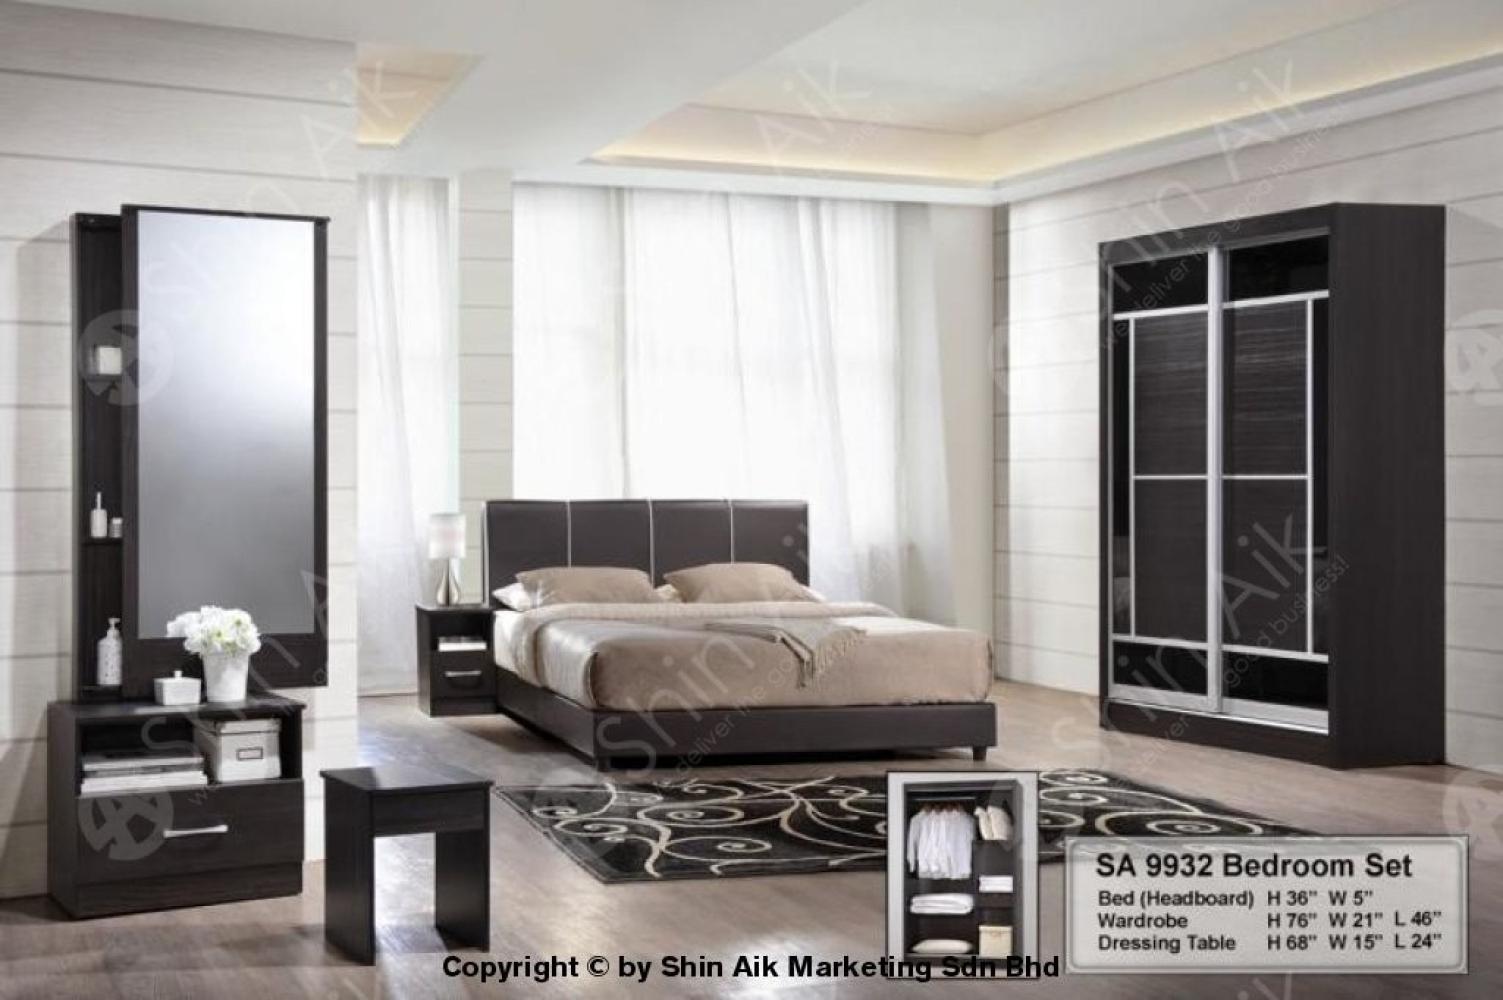 Wenge Modern Contemporary Bedroom Set (4'x6'ft) - SA9932BRS